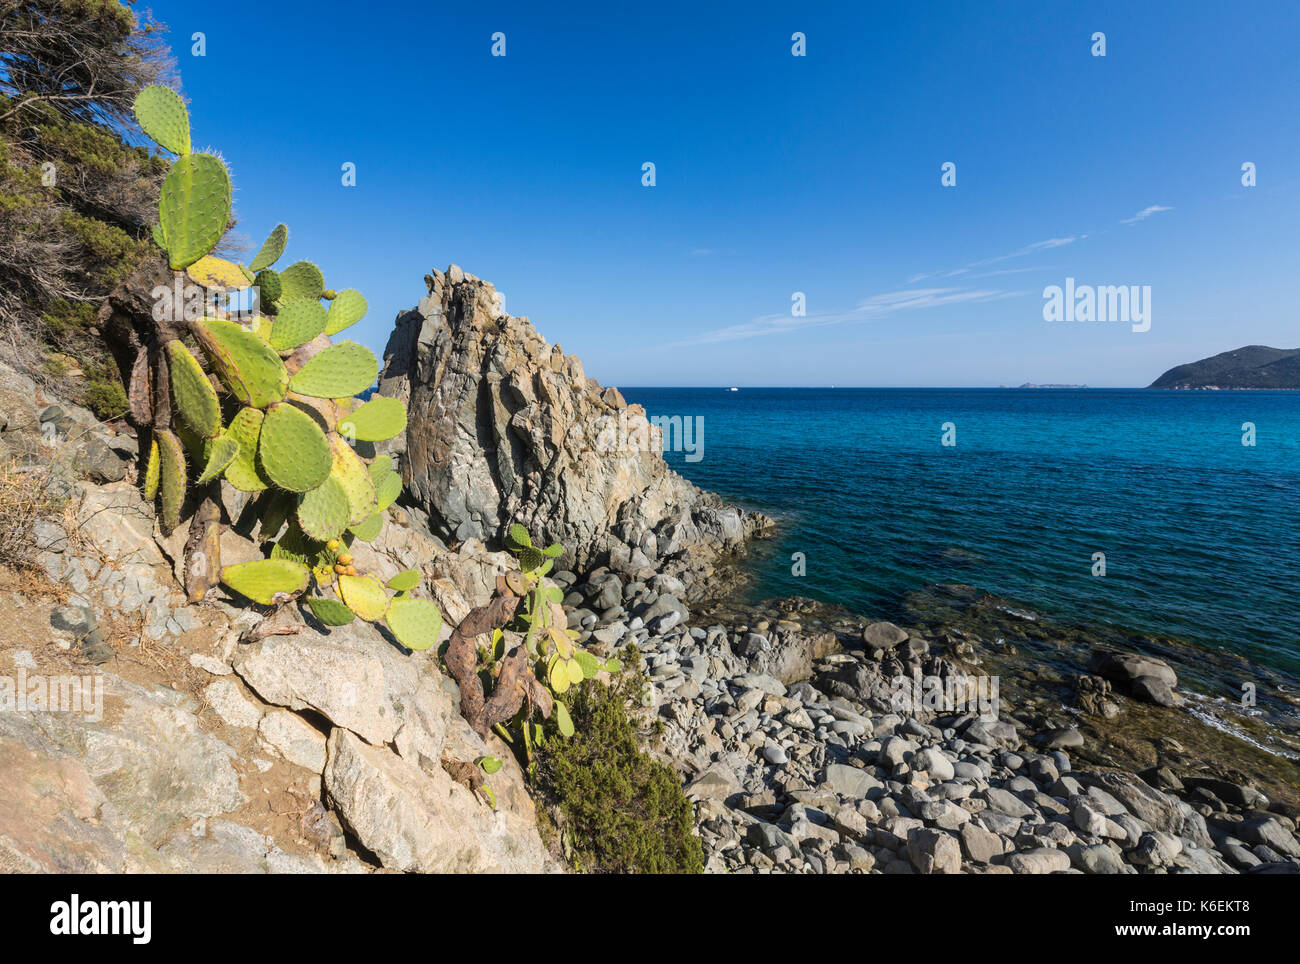 Prickly pears on the cliffs surround the blue sea of Cala Monte Turno Castiadas Cagliari Sardinia Italy Europe - Stock Image